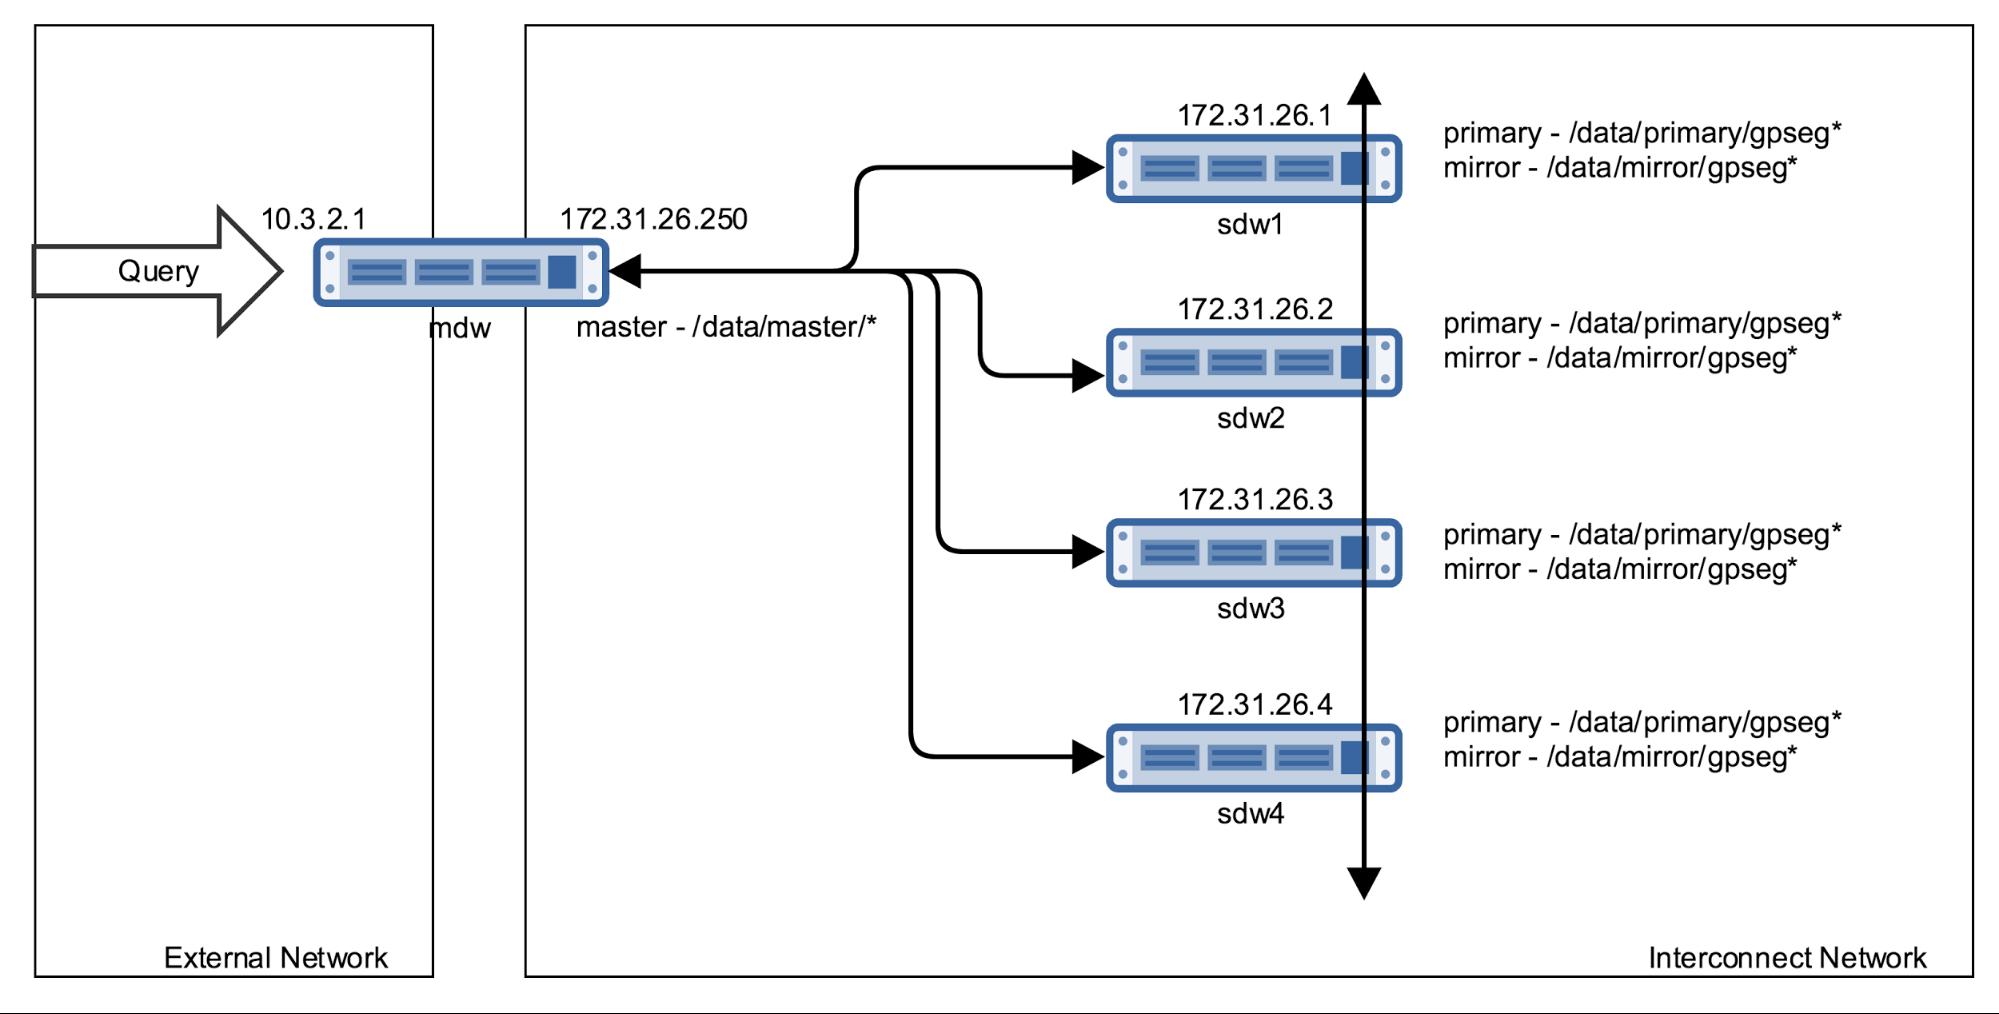 Figure 1. Basic Segmented Network without Zettaset BDEncrypt